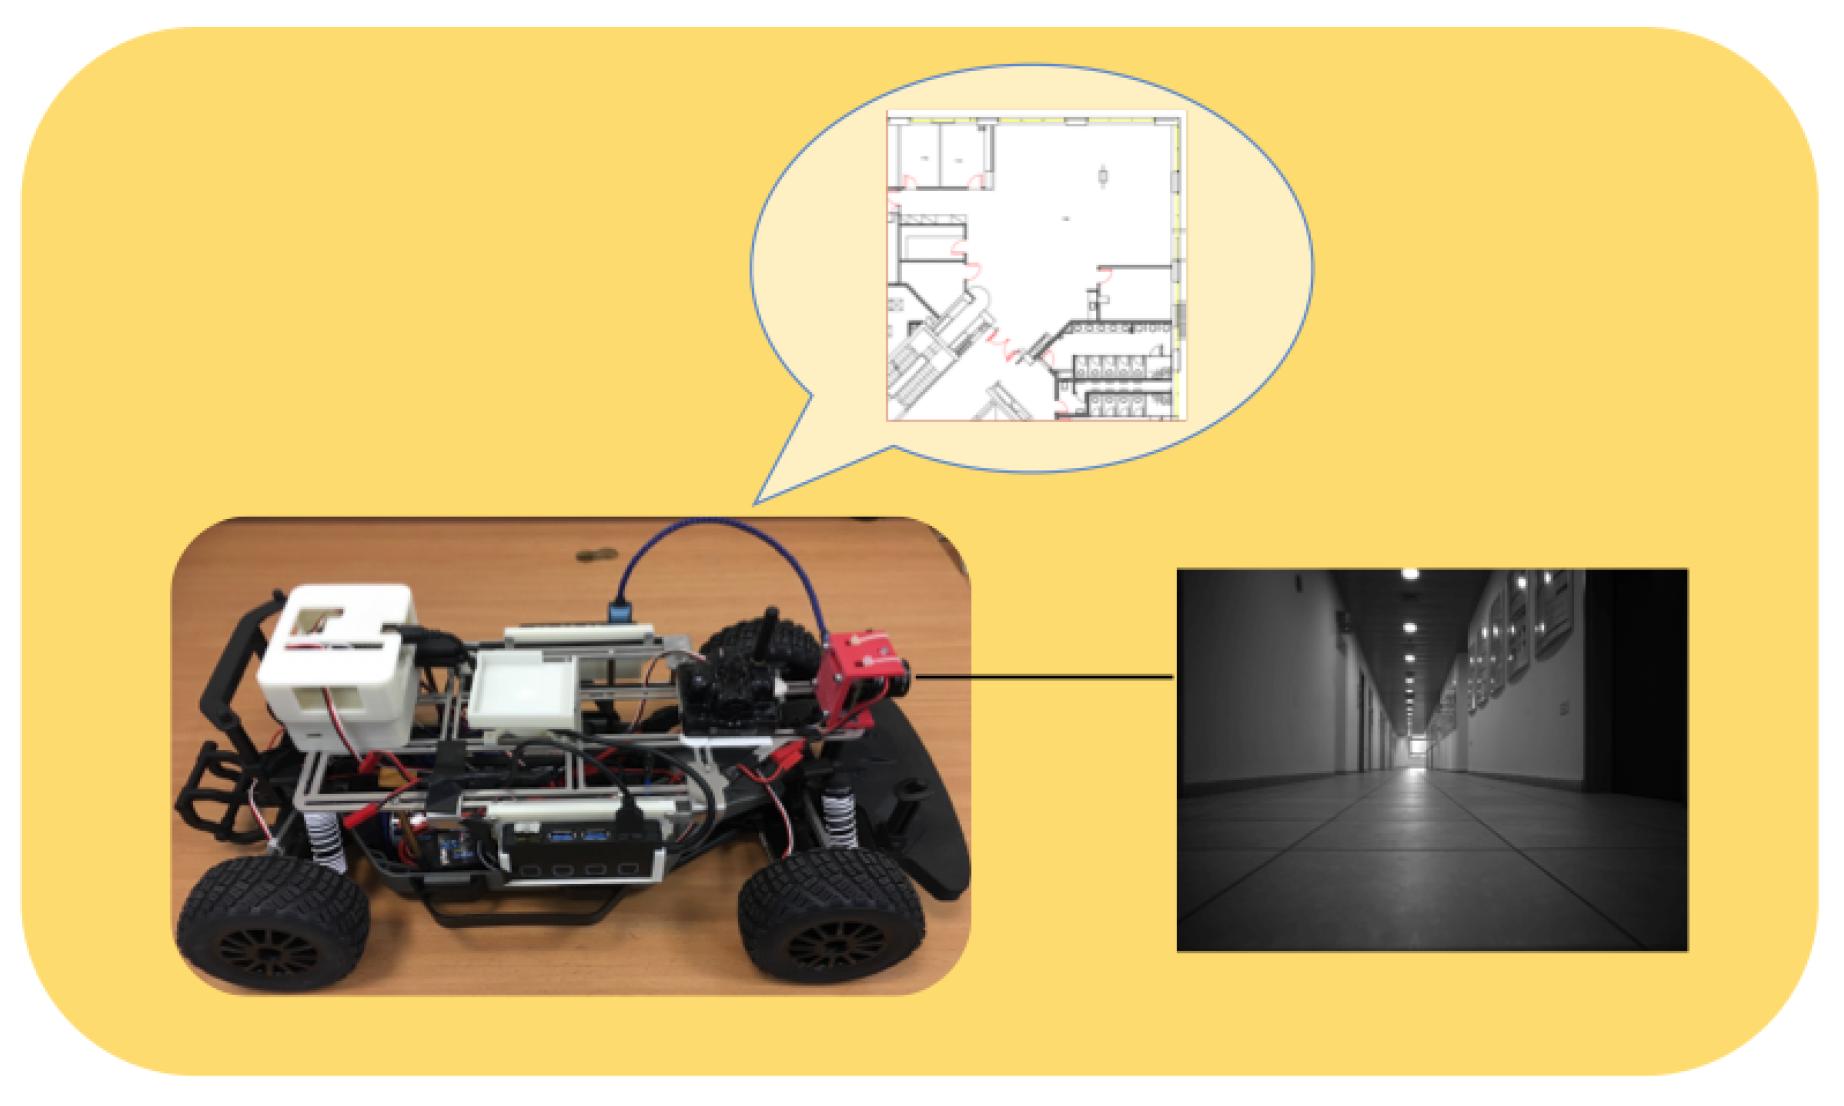 Robotics Free Full Text Floorvloc A Modular Approach To Floorplan Monocular Localization Html